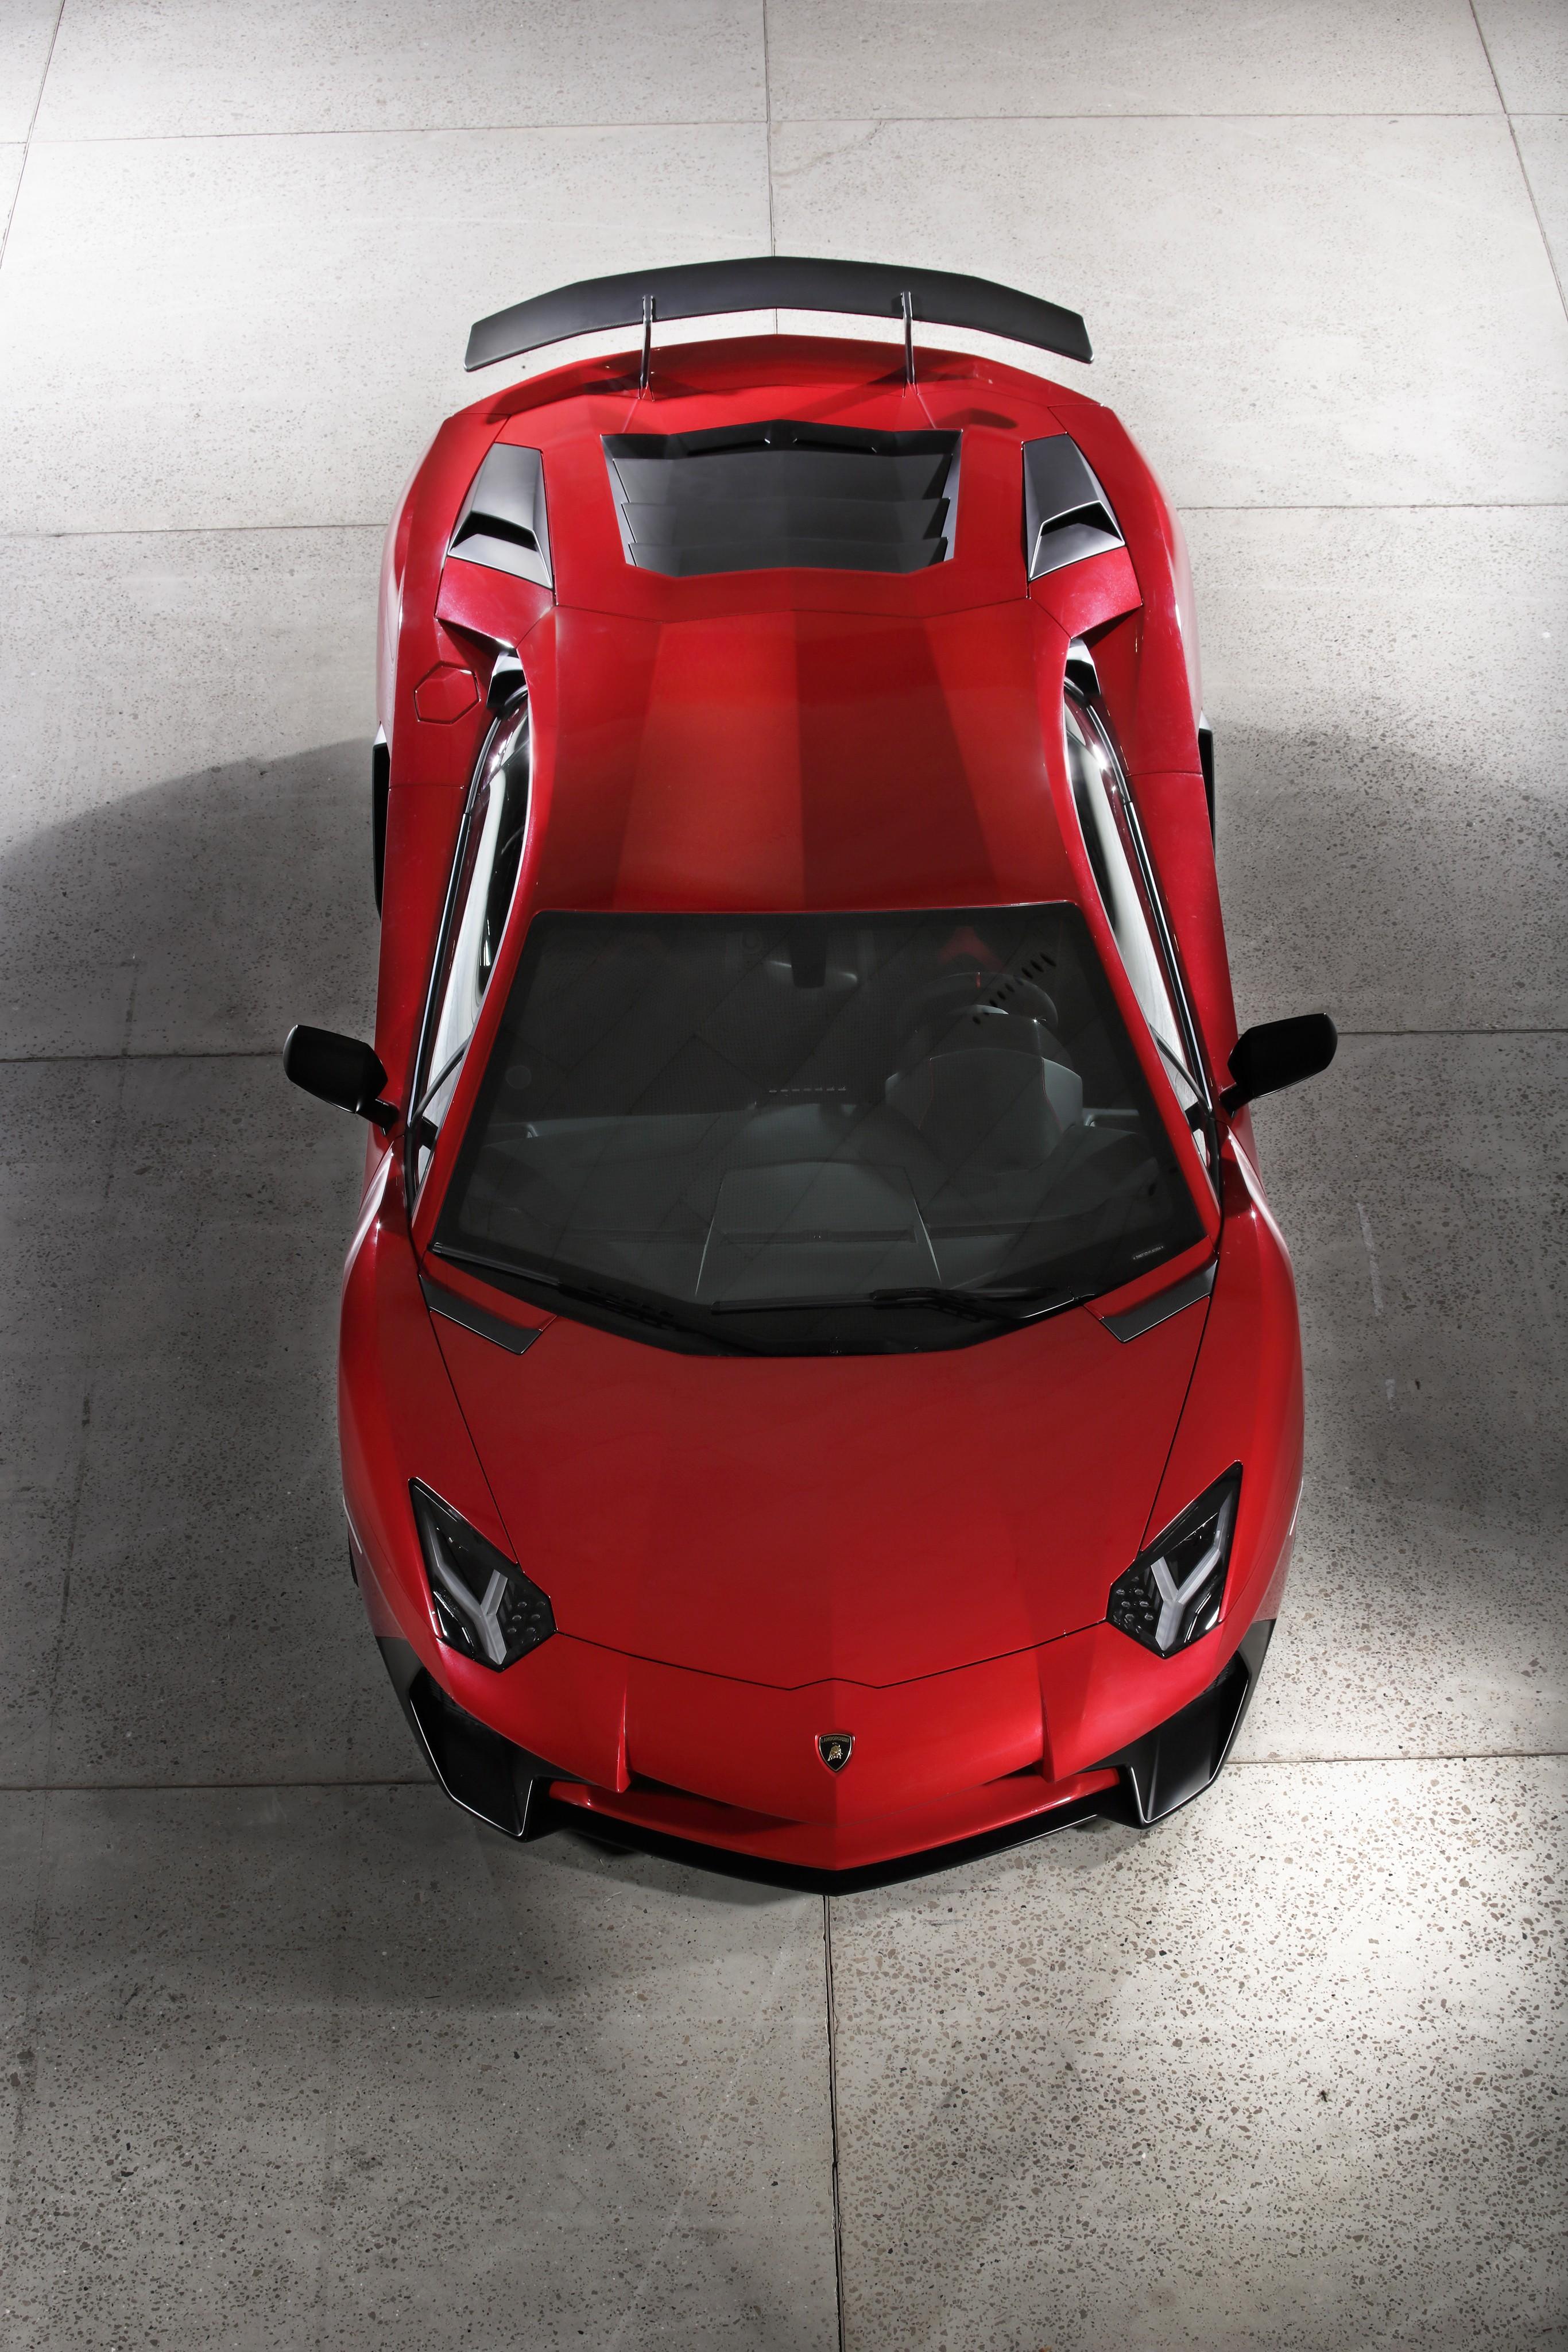 Automotive Car Parts >> LAMBORGHINI Aventador LP750-4 SV specs - 2015, 2016, 2017, 2018 - autoevolution